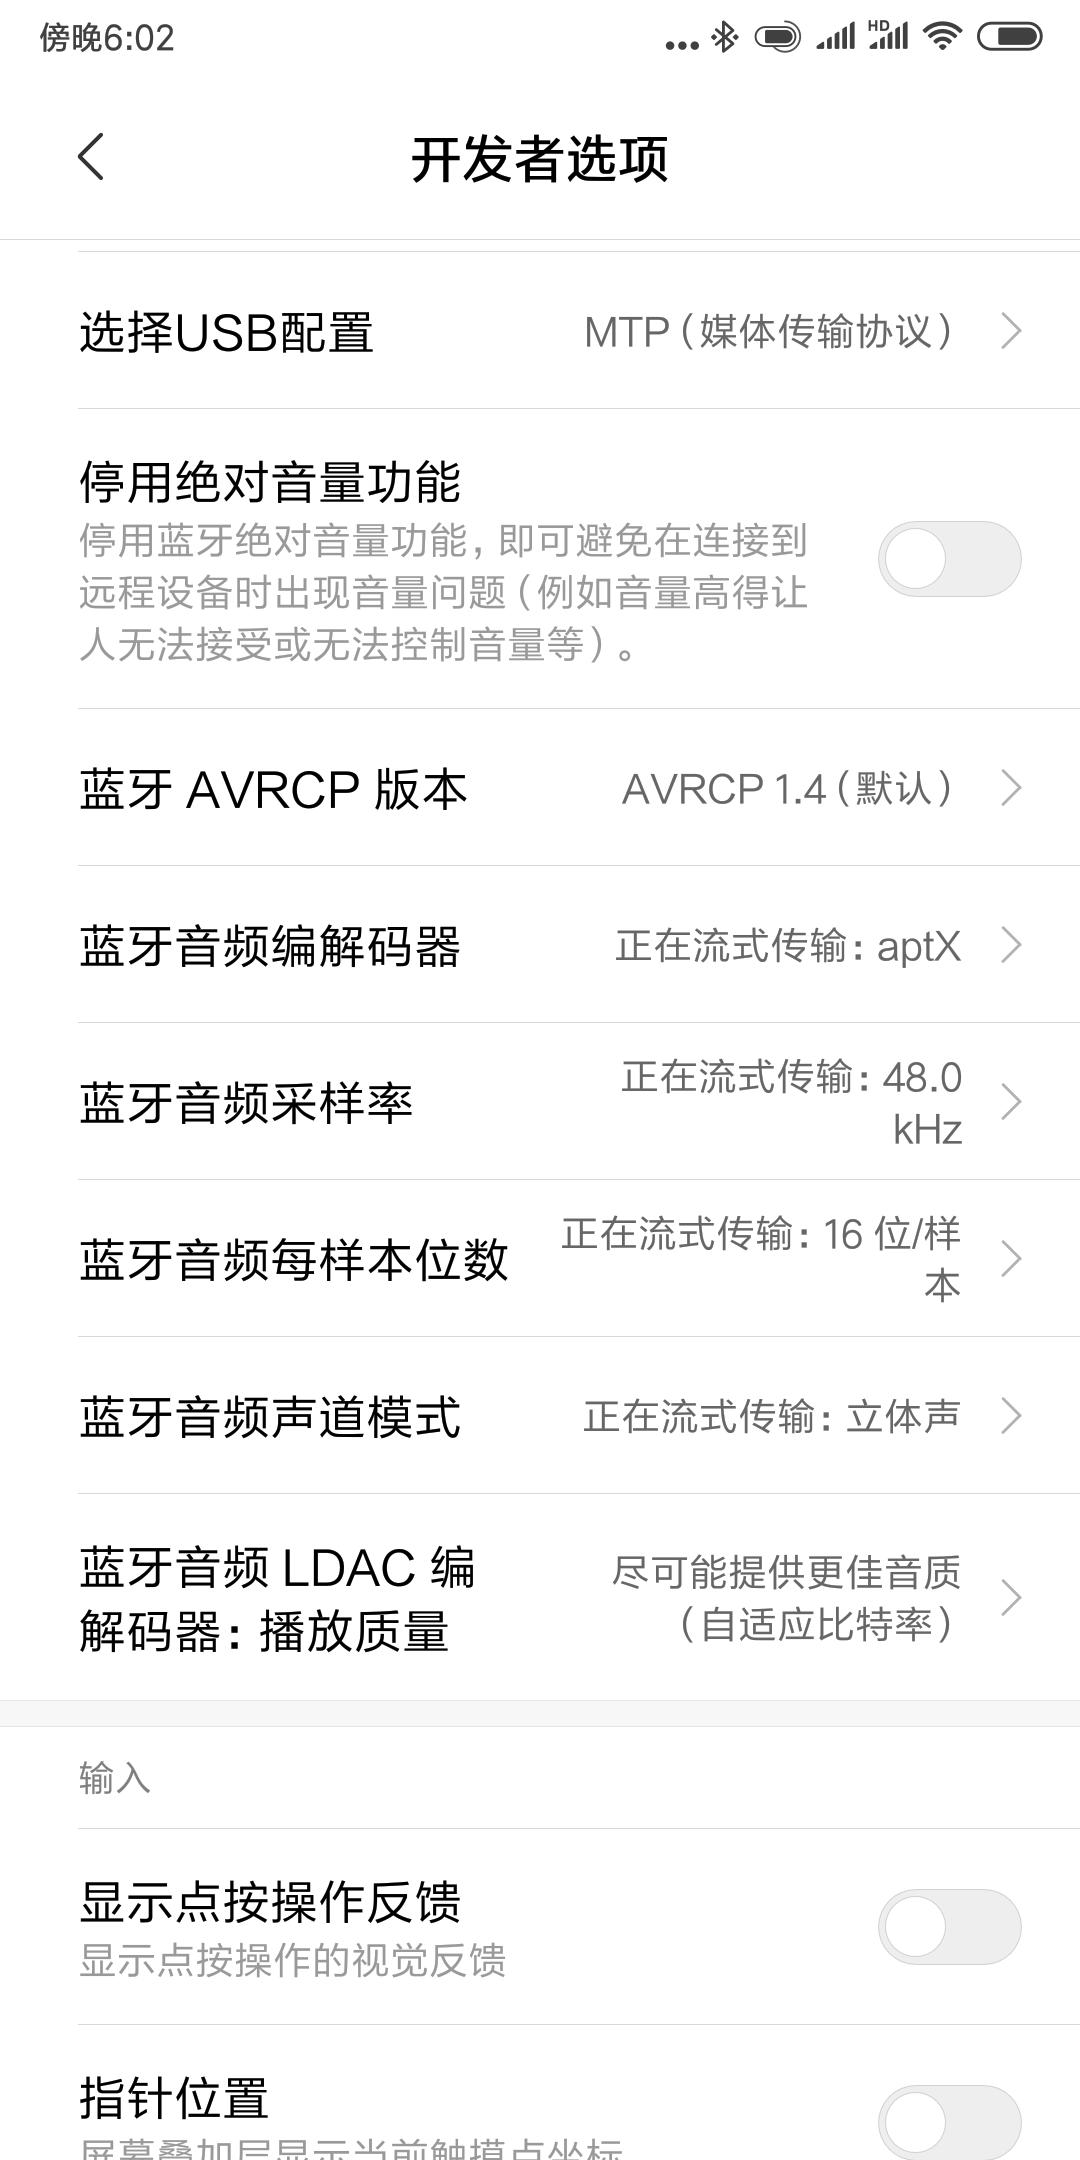 Screenshot_2018-10-09-18-02-18-386_com.android.settings.png